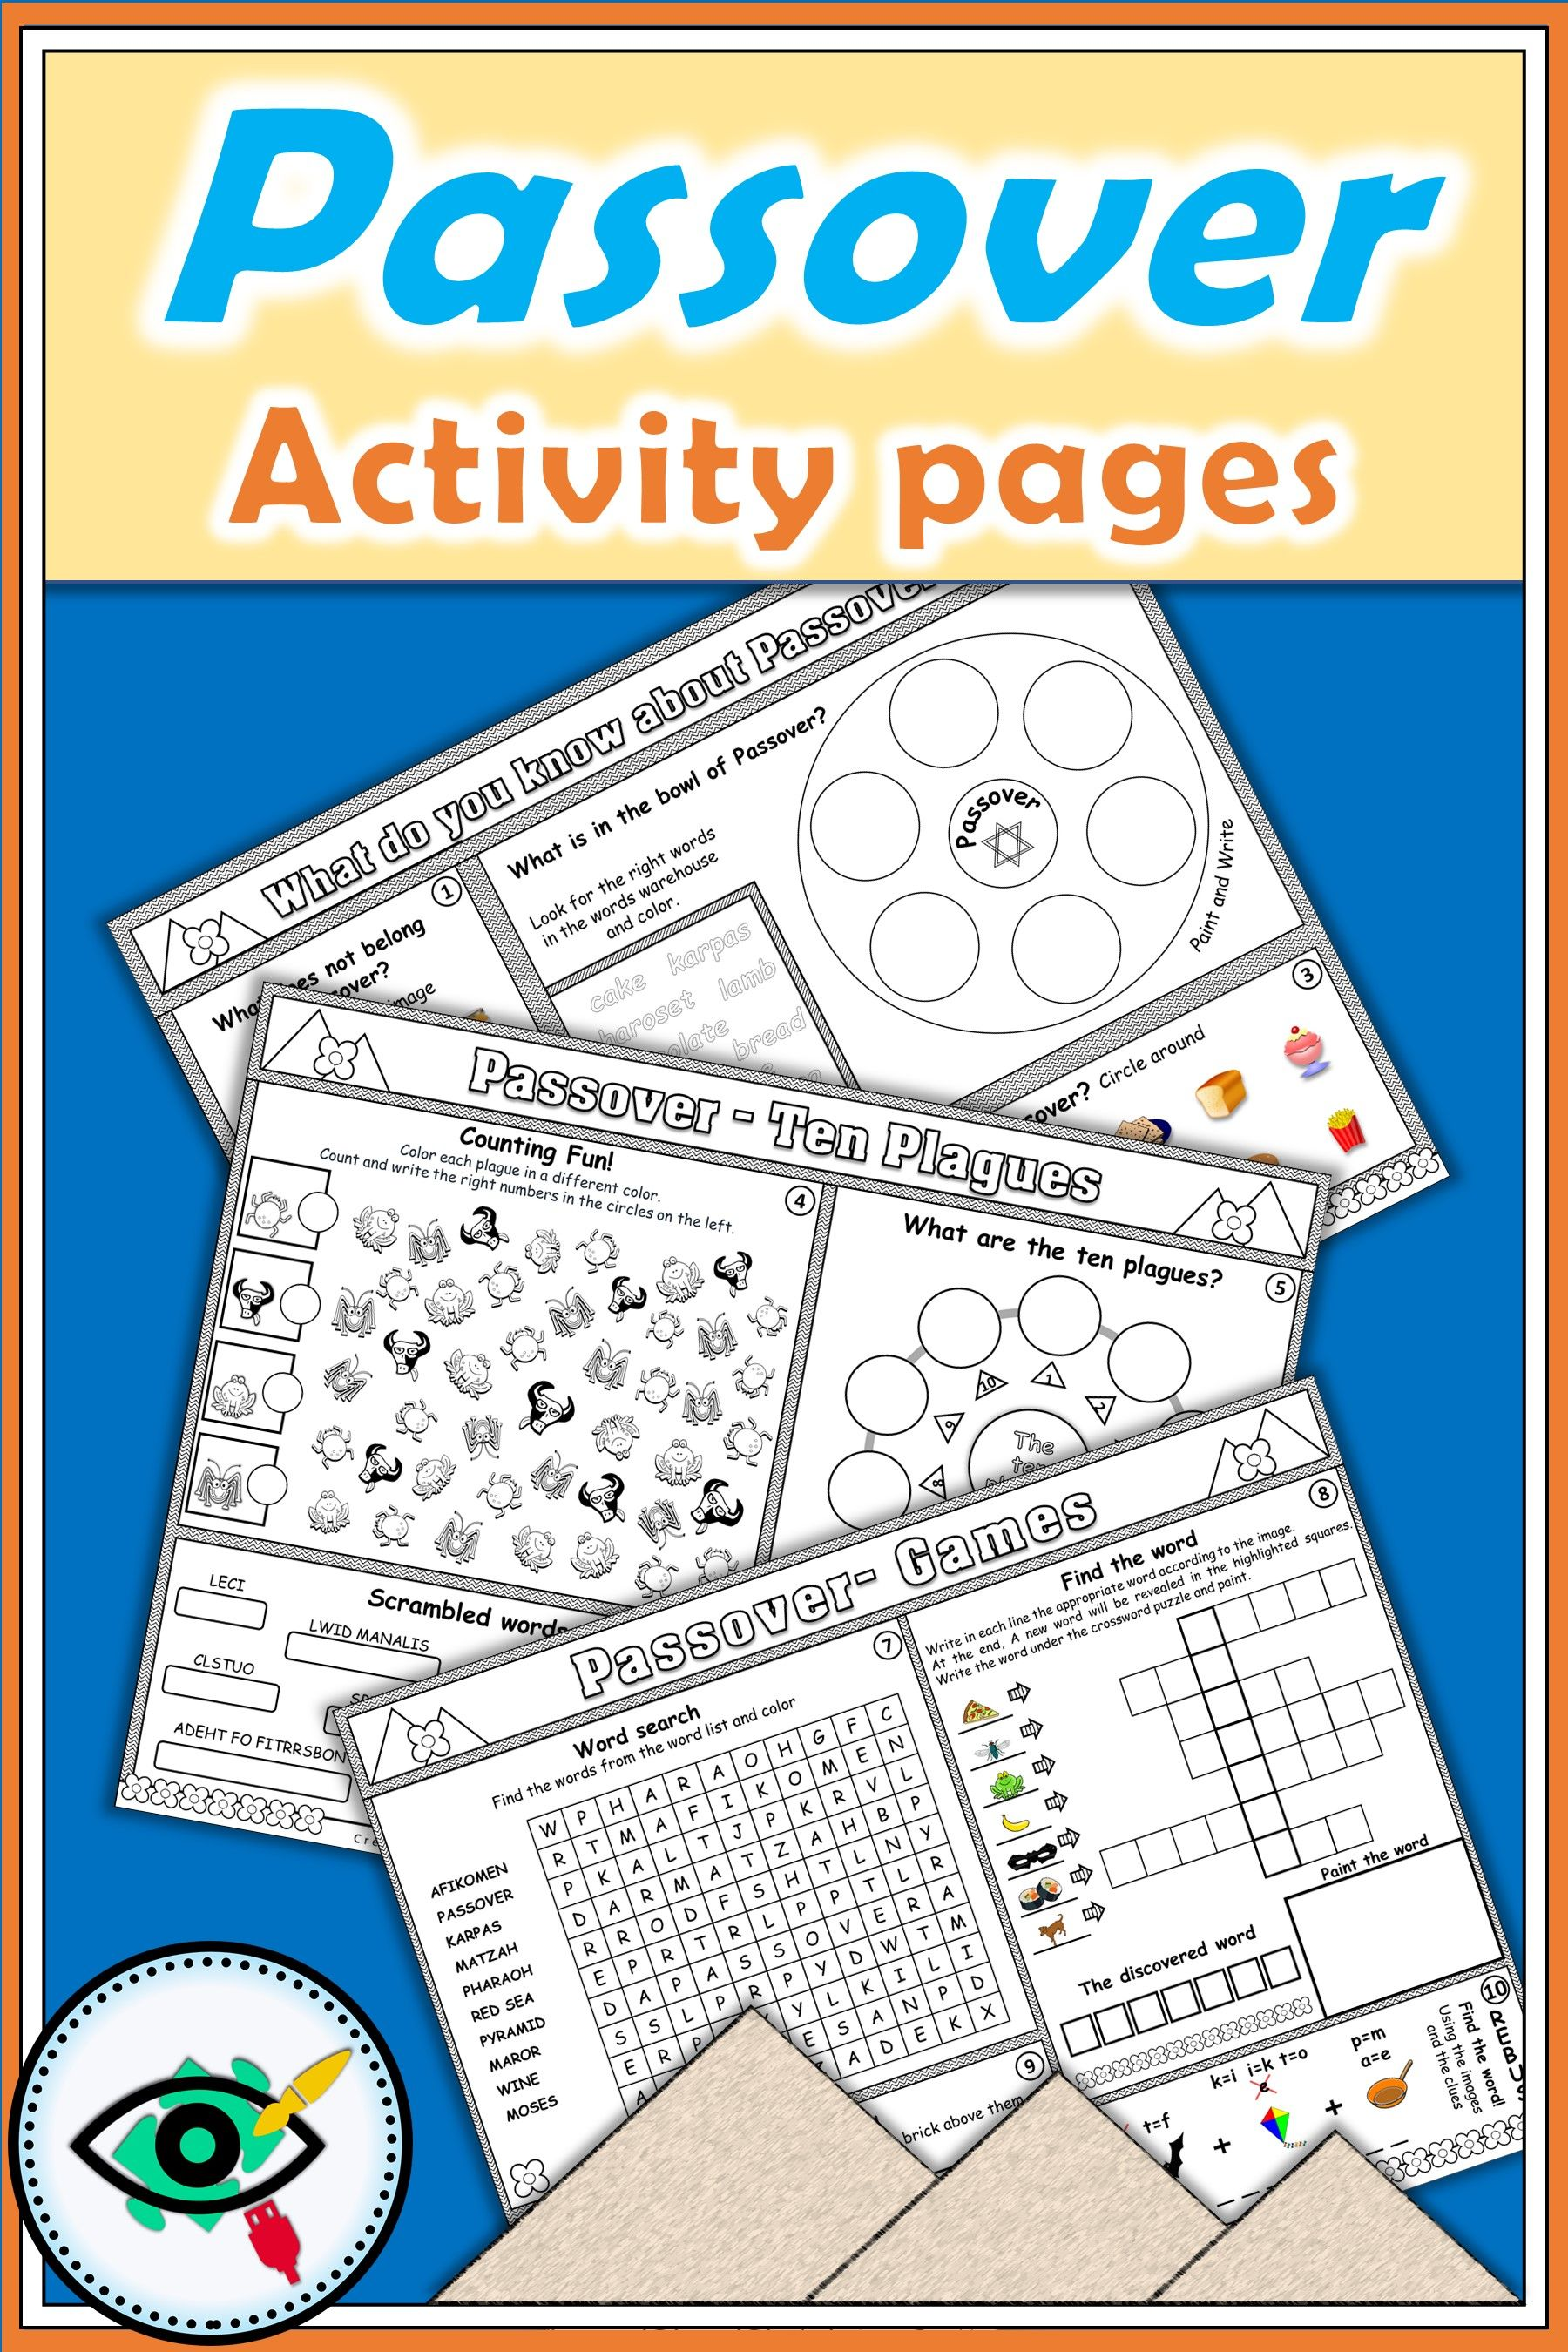 Passover Focus Pages Activities For Primary School Homeschooling Great Activity For The Kids In The Seder Ni Passover Crafts Passover Activities Activities [ 2700 x 1800 Pixel ]